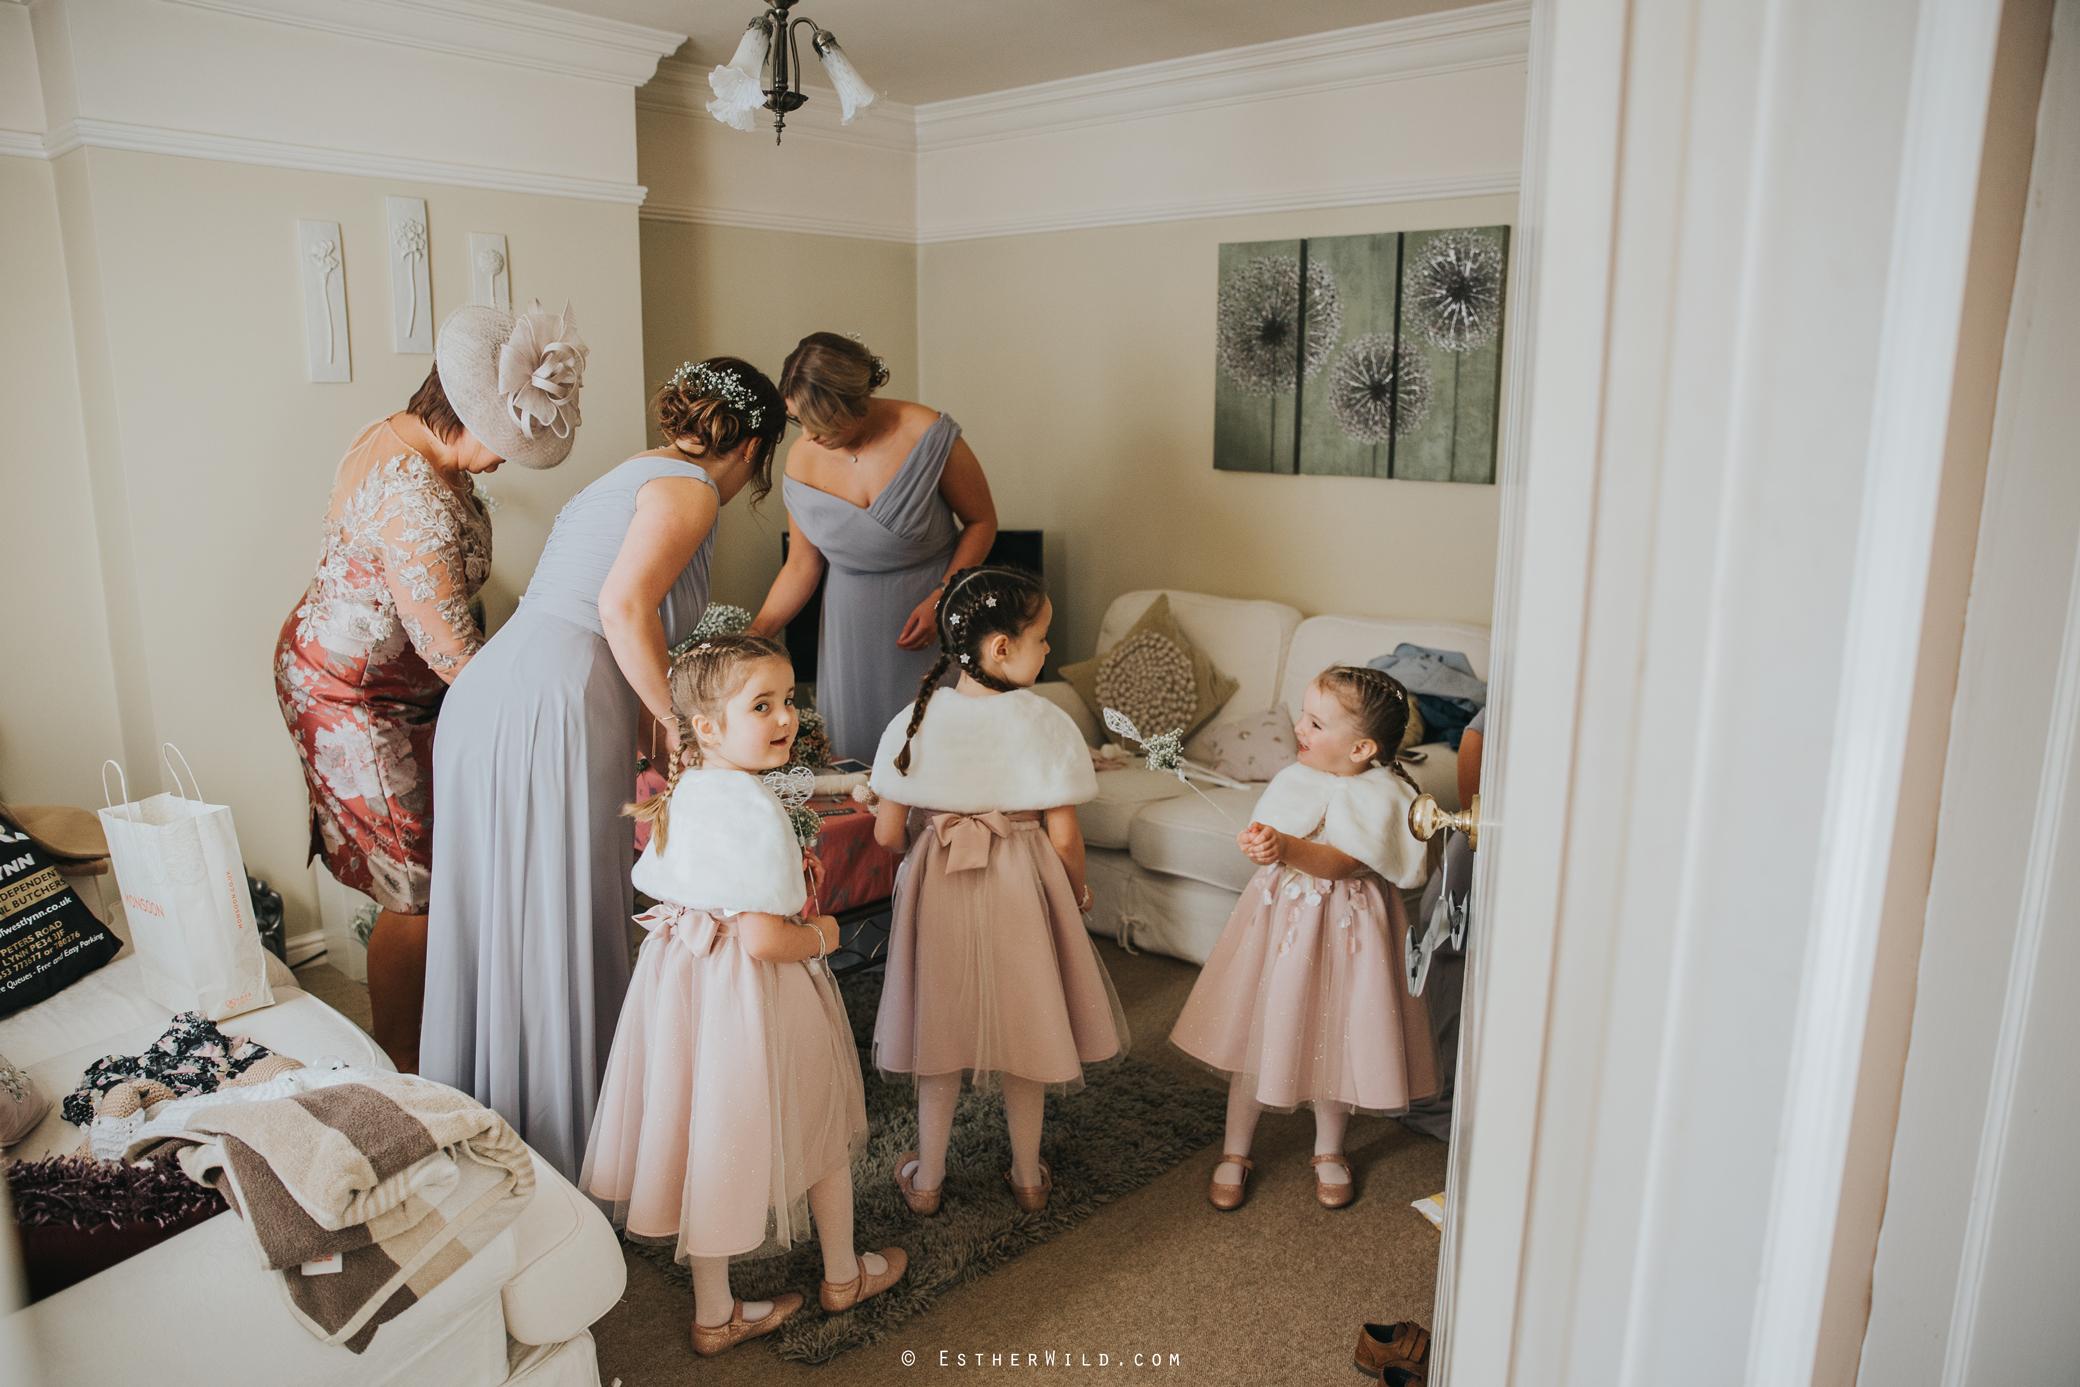 Wedding_Kings_Lynn_Town_Hall_Norfolk_Photographer_Esther_Wild_IMG_0511.jpg